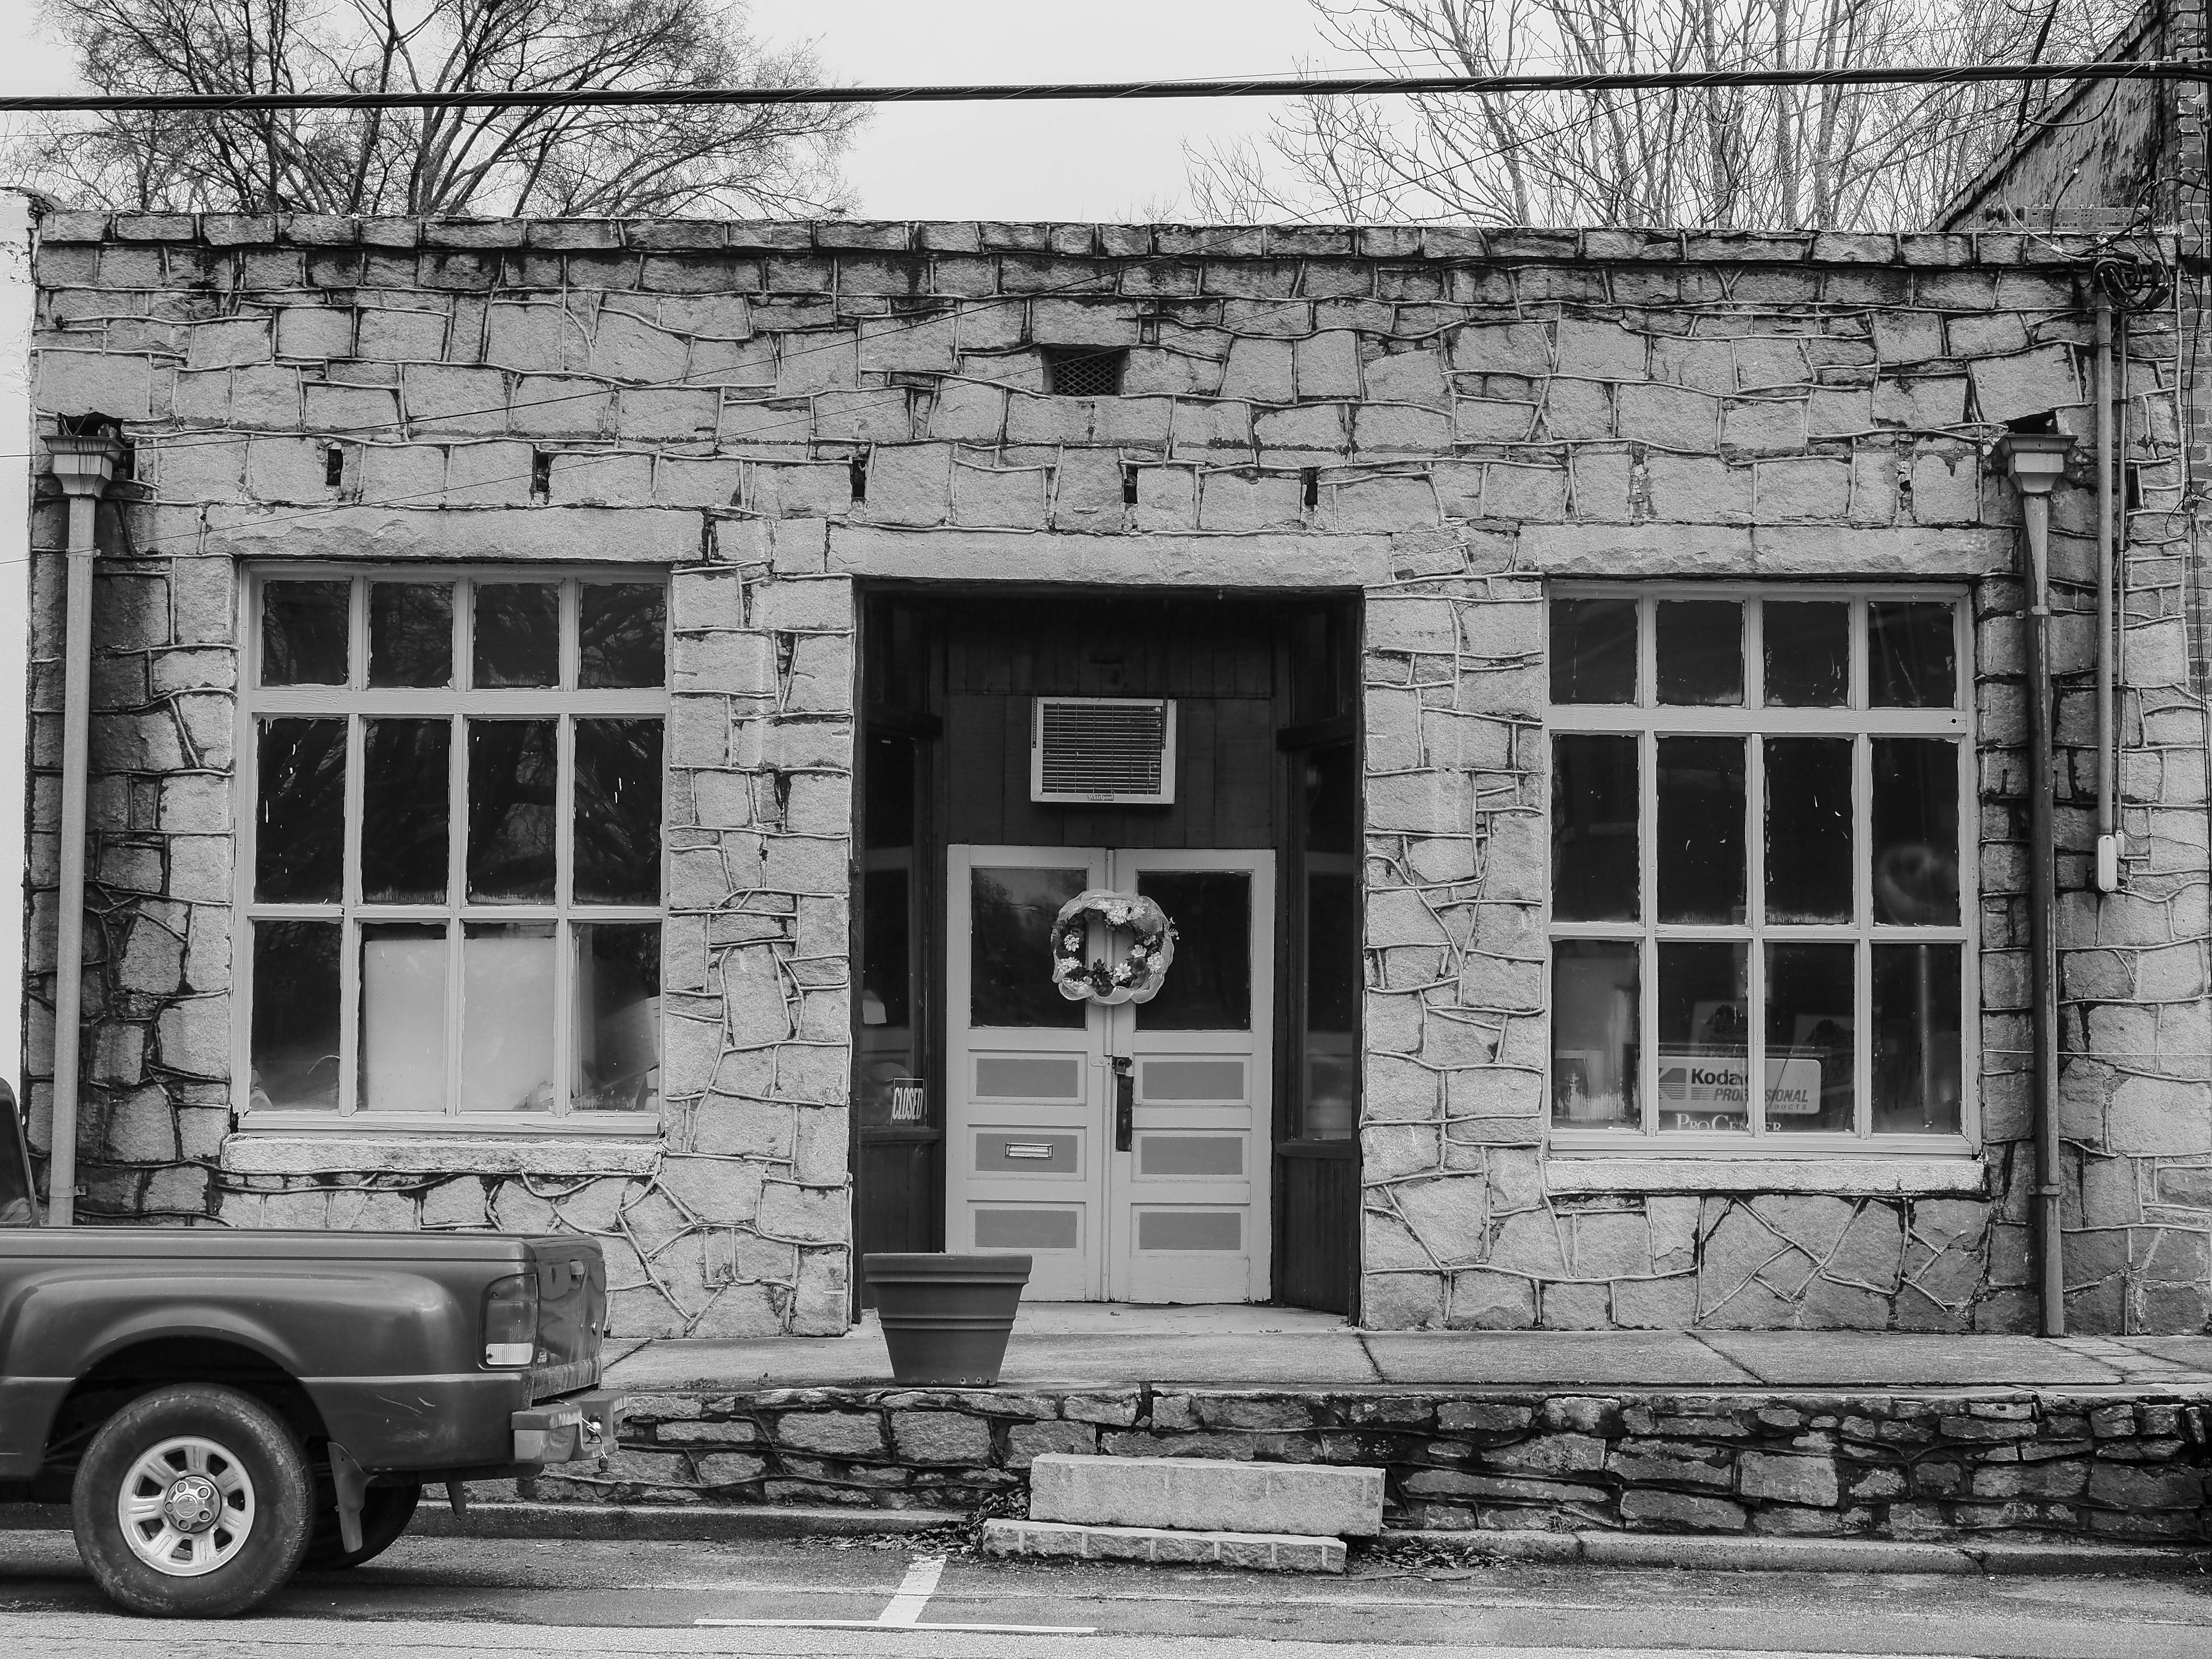 Highway 78 Lexington, Georgia, USA